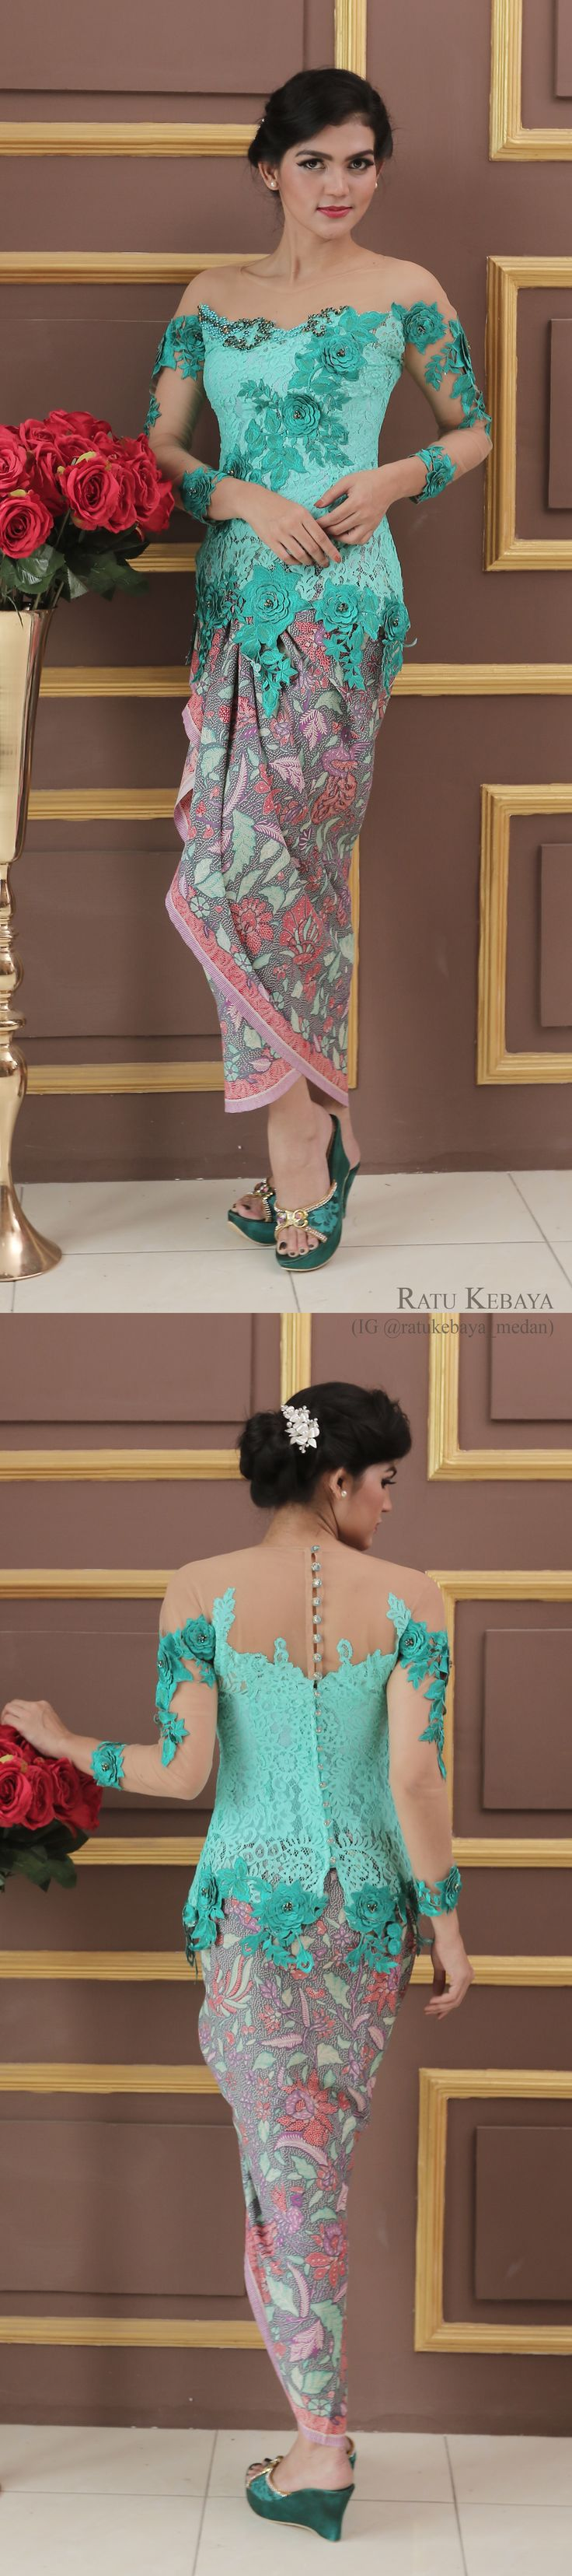 best gaun malam images on pinterest kebaya muslim bridal